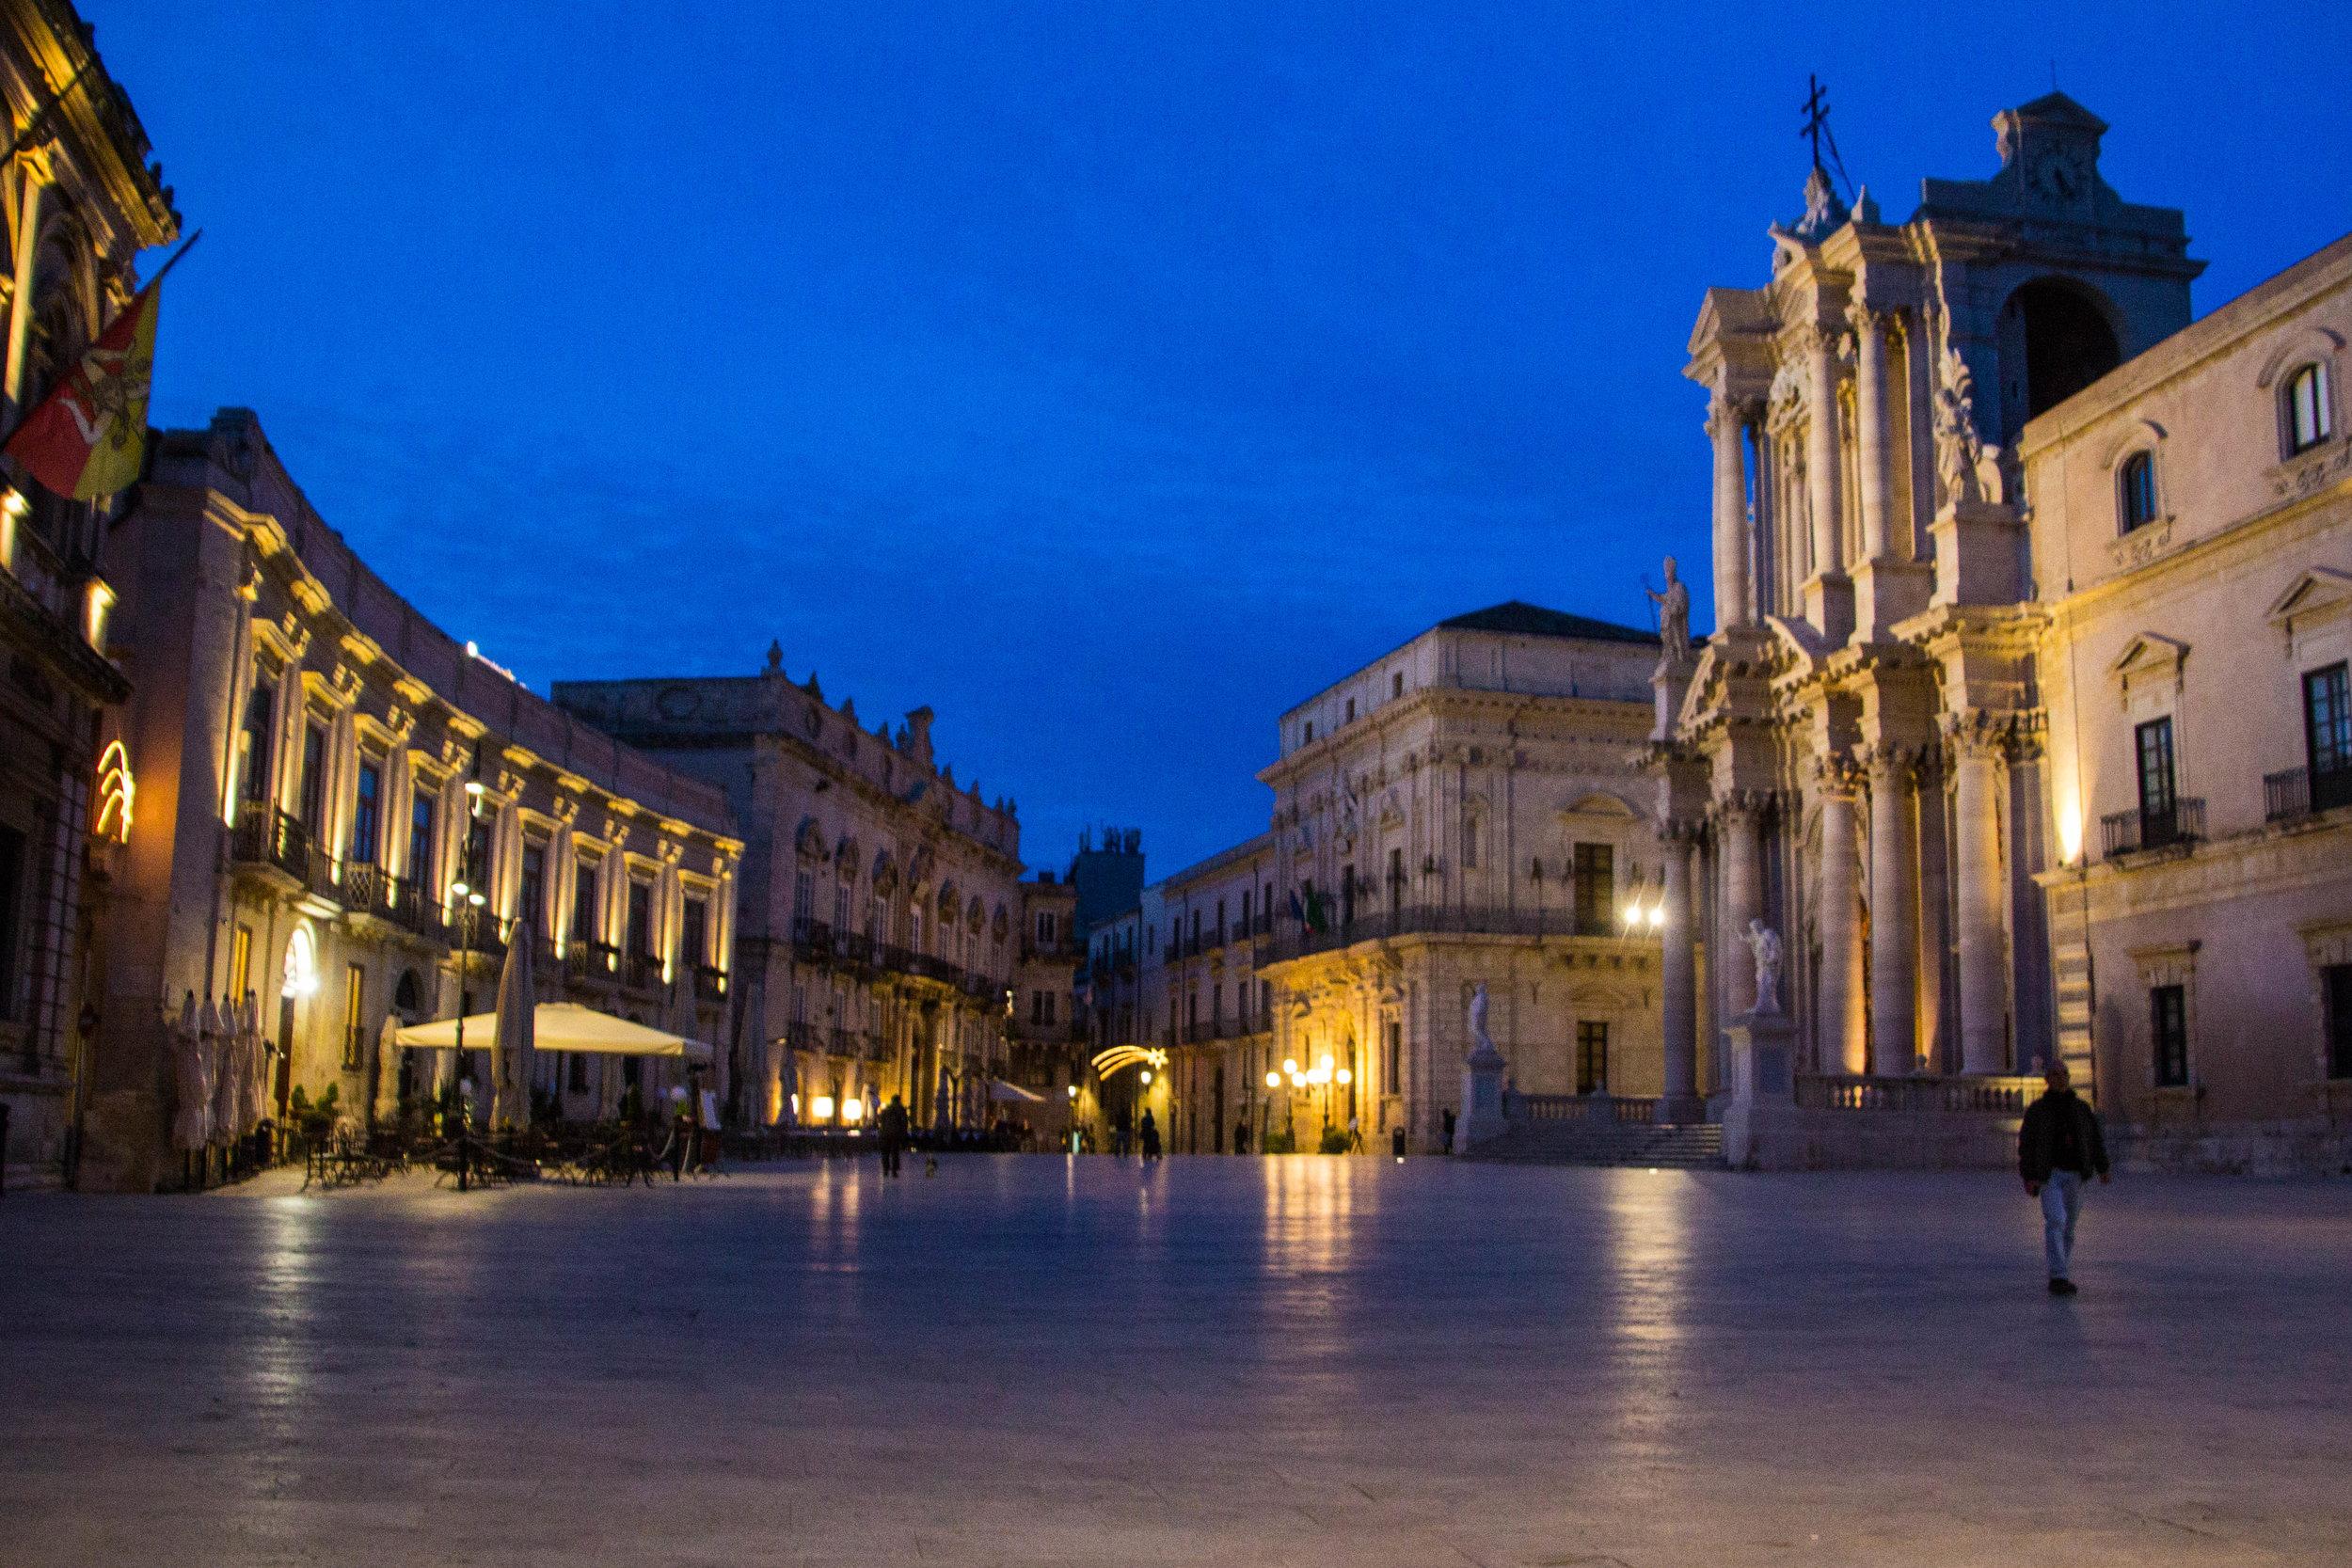 piazza-duomo-sunset-ortygia-syracuse-sicily-33.jpg